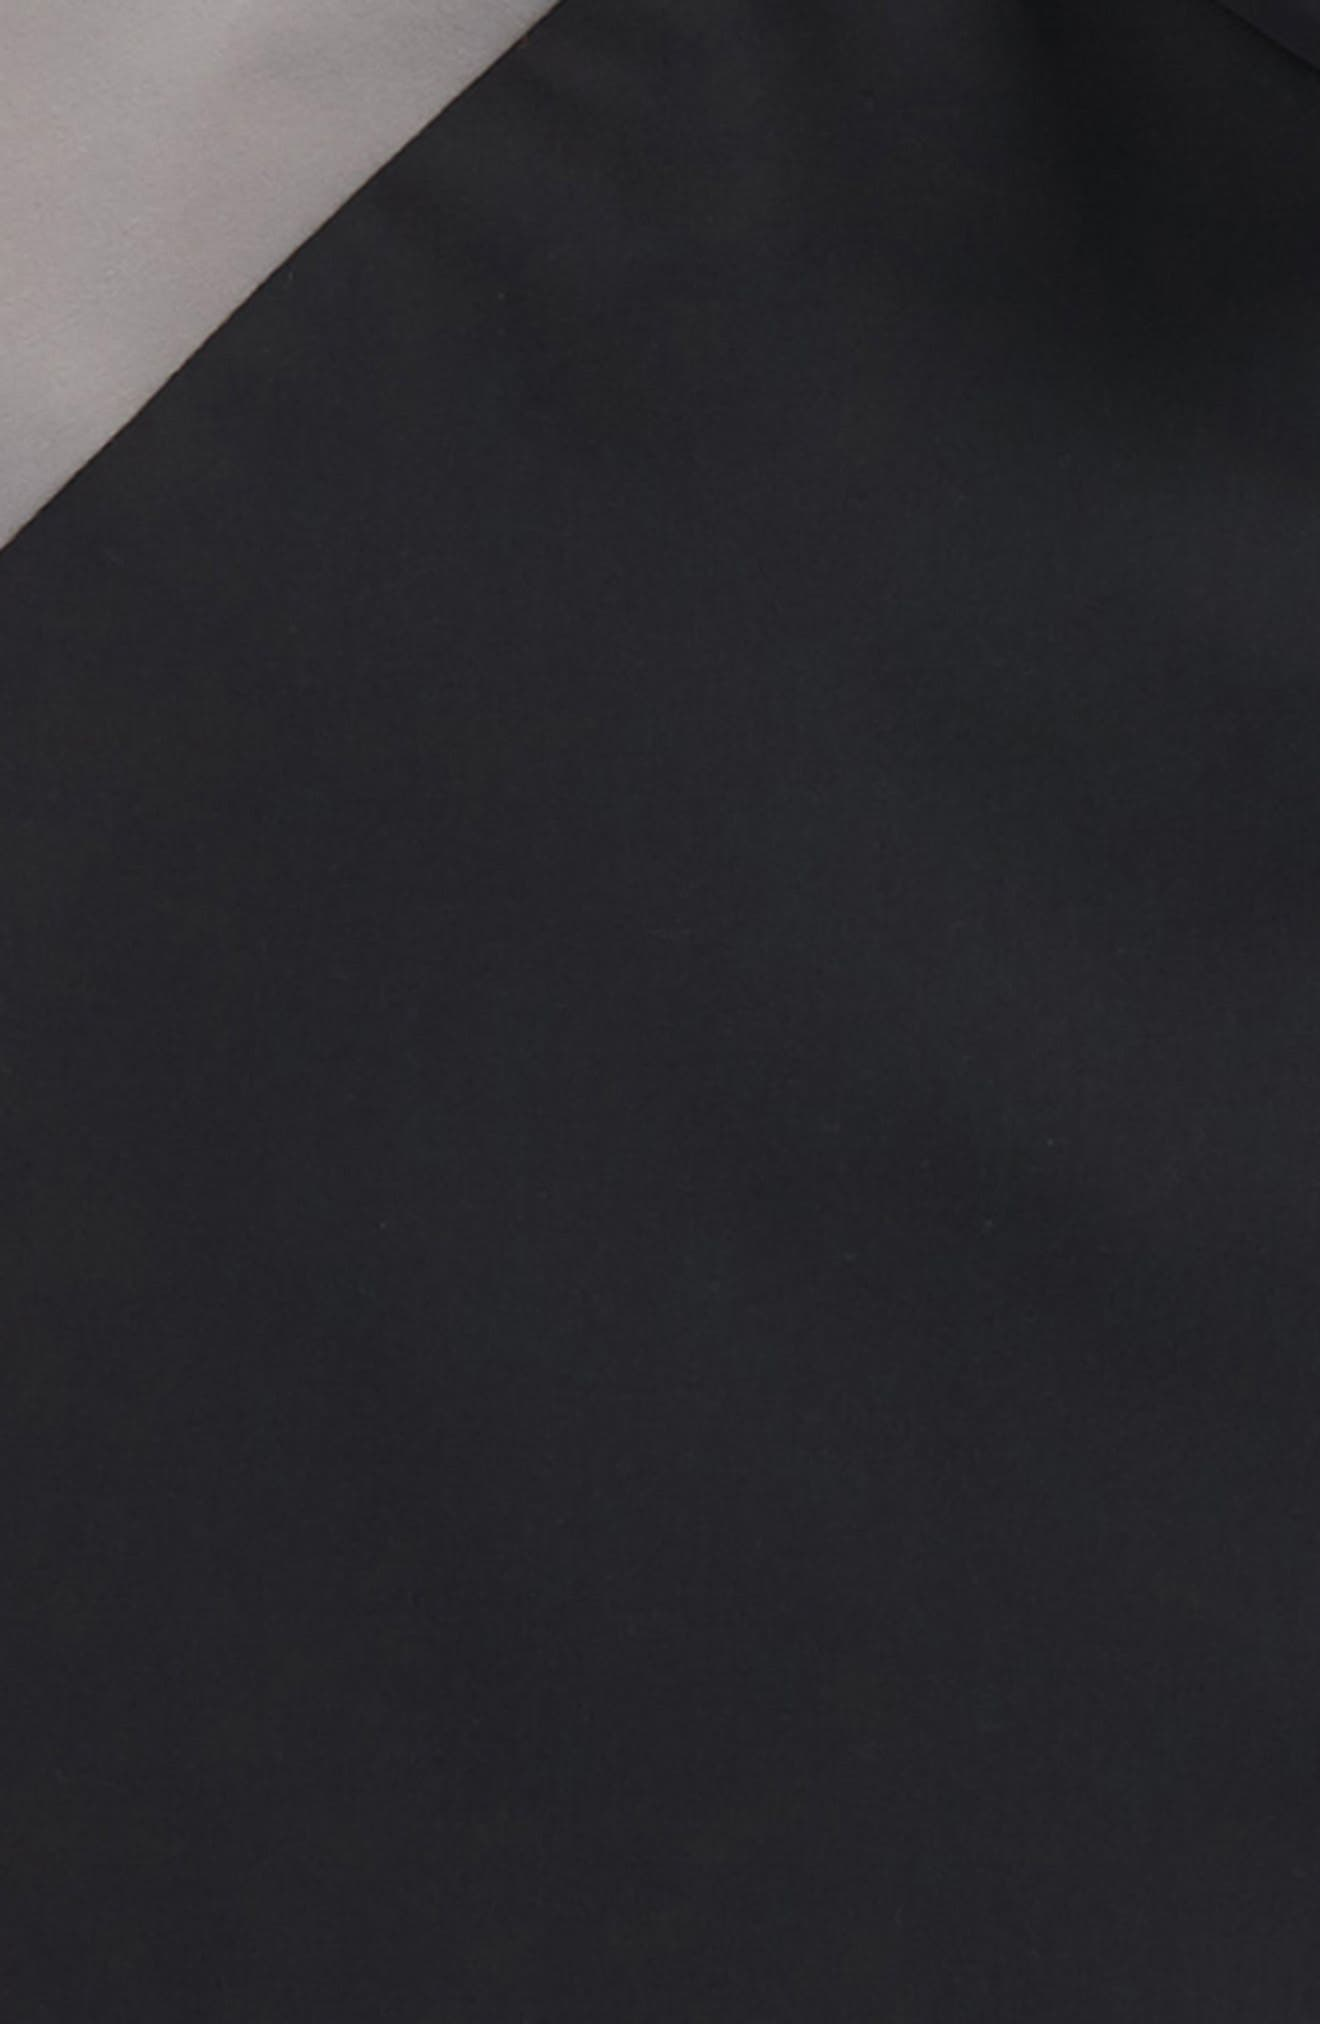 Long Sleeve Rashguard,                             Alternate thumbnail 2, color,                             Black/ Dark Grey